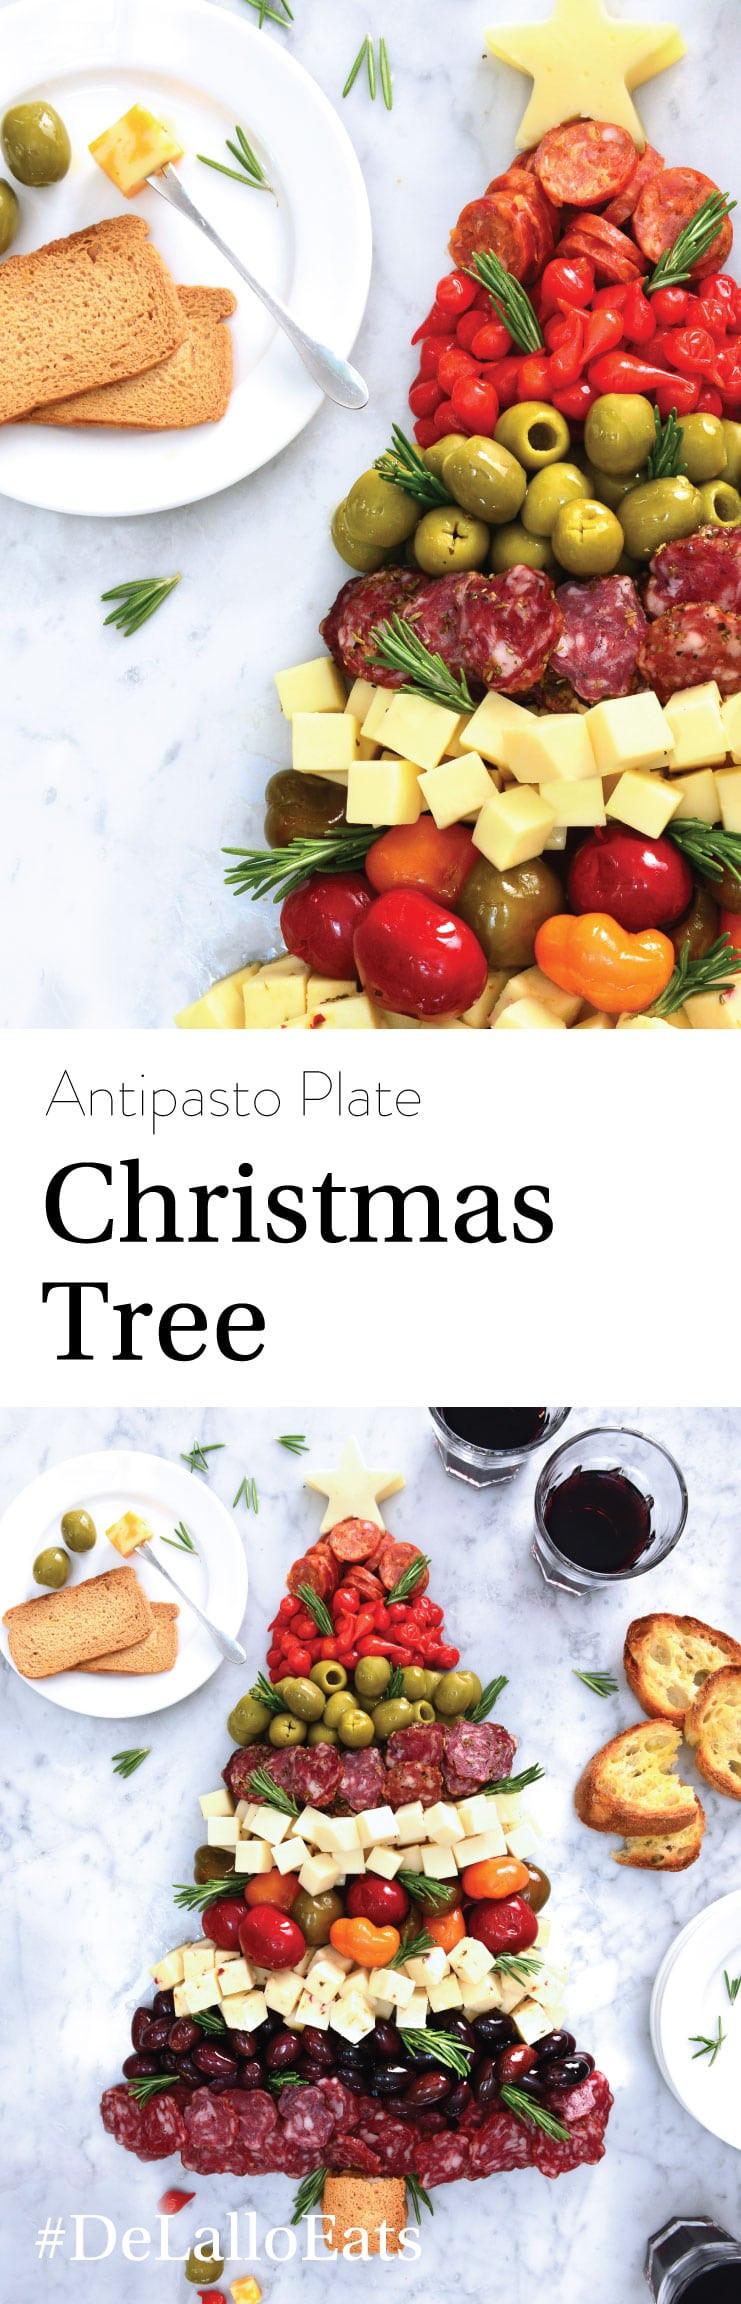 Antipasto Christmas Tree  Christmas Tree Antipasto Plate DeLallo